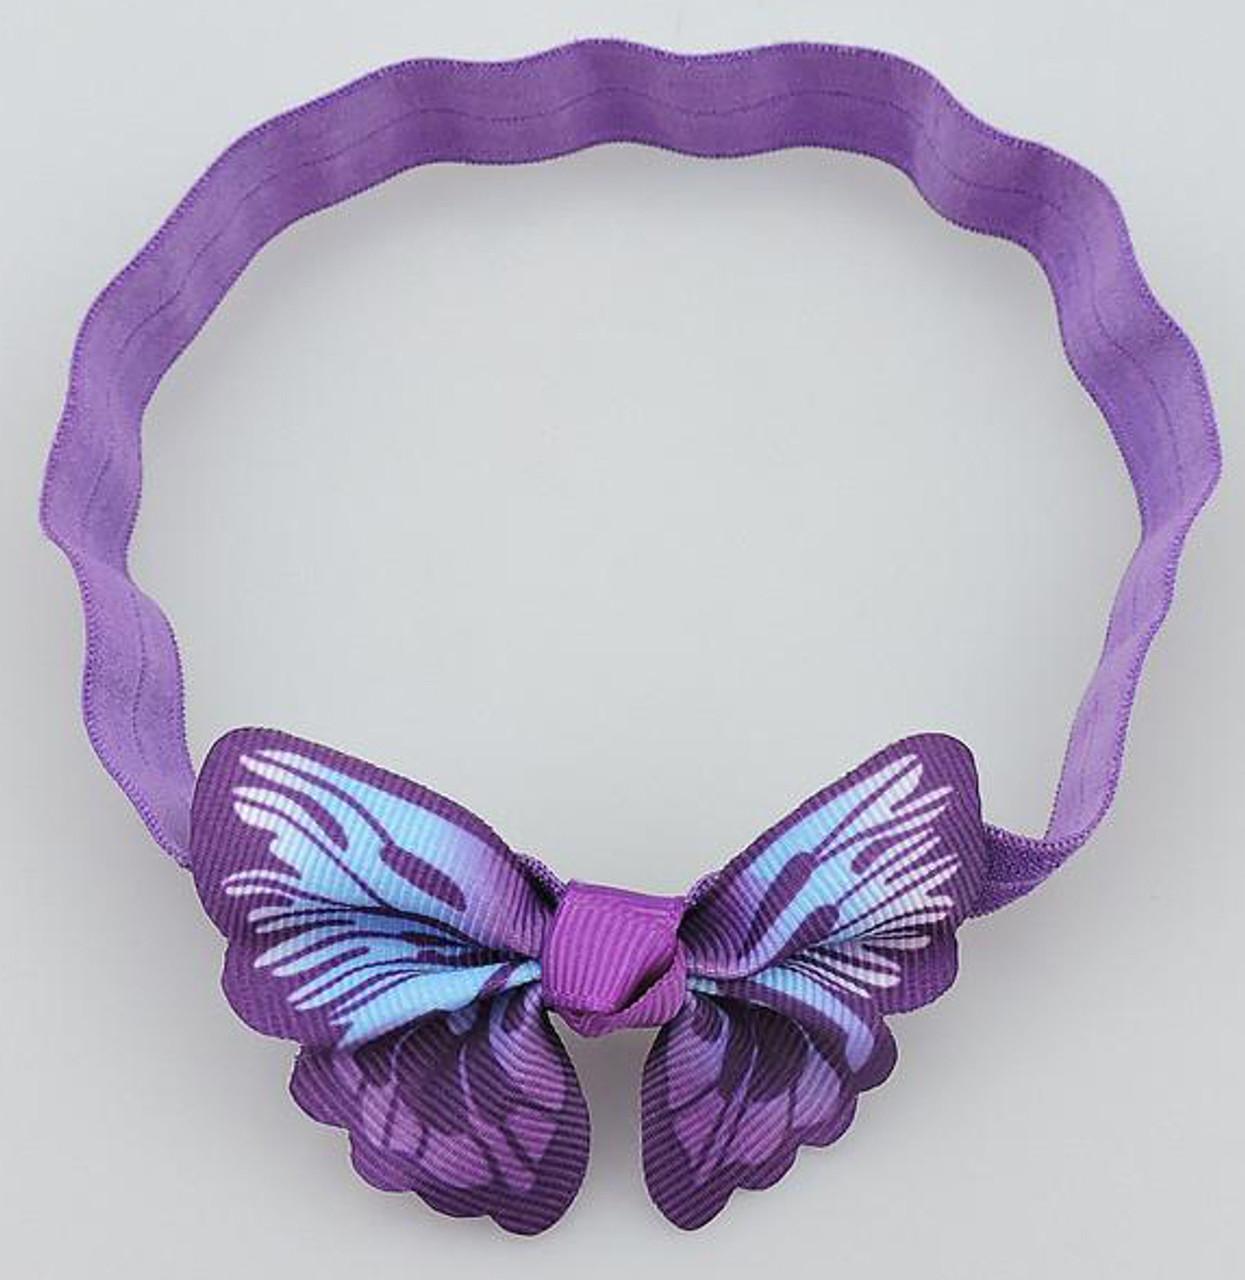 Lavender butterfly headbands